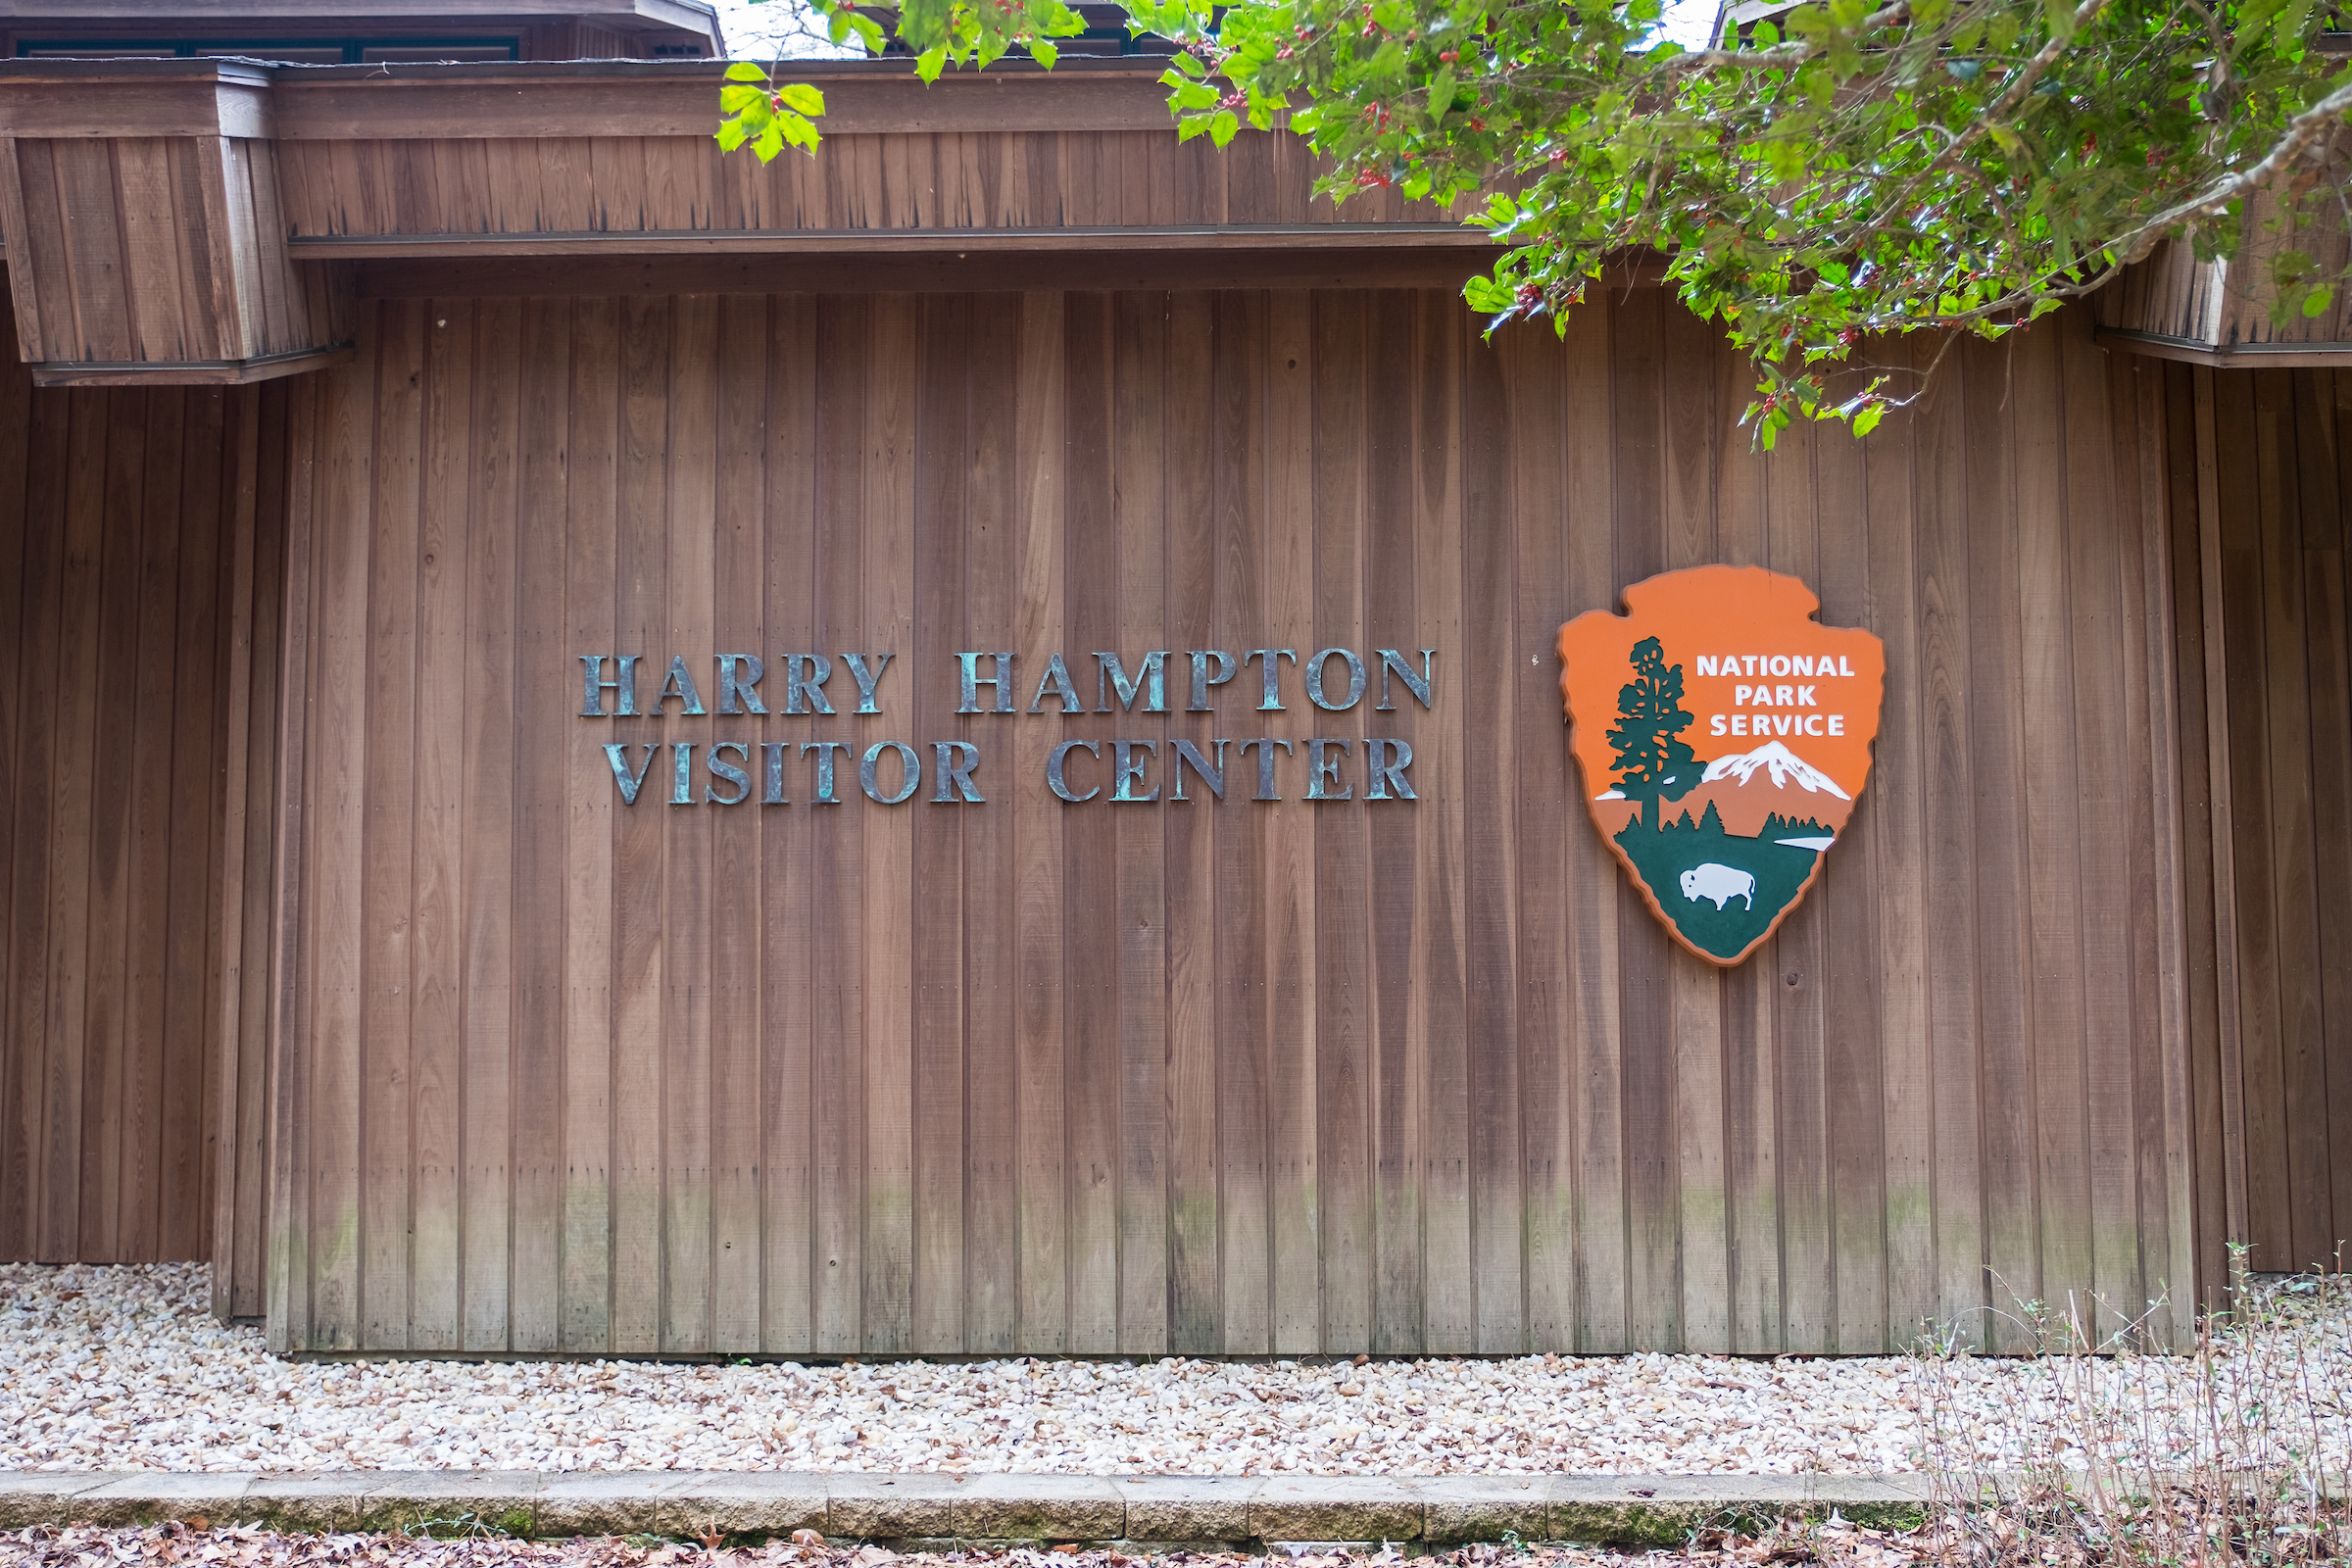 20160208-JI-Congaree National Park-261-_DSF8555.jpg